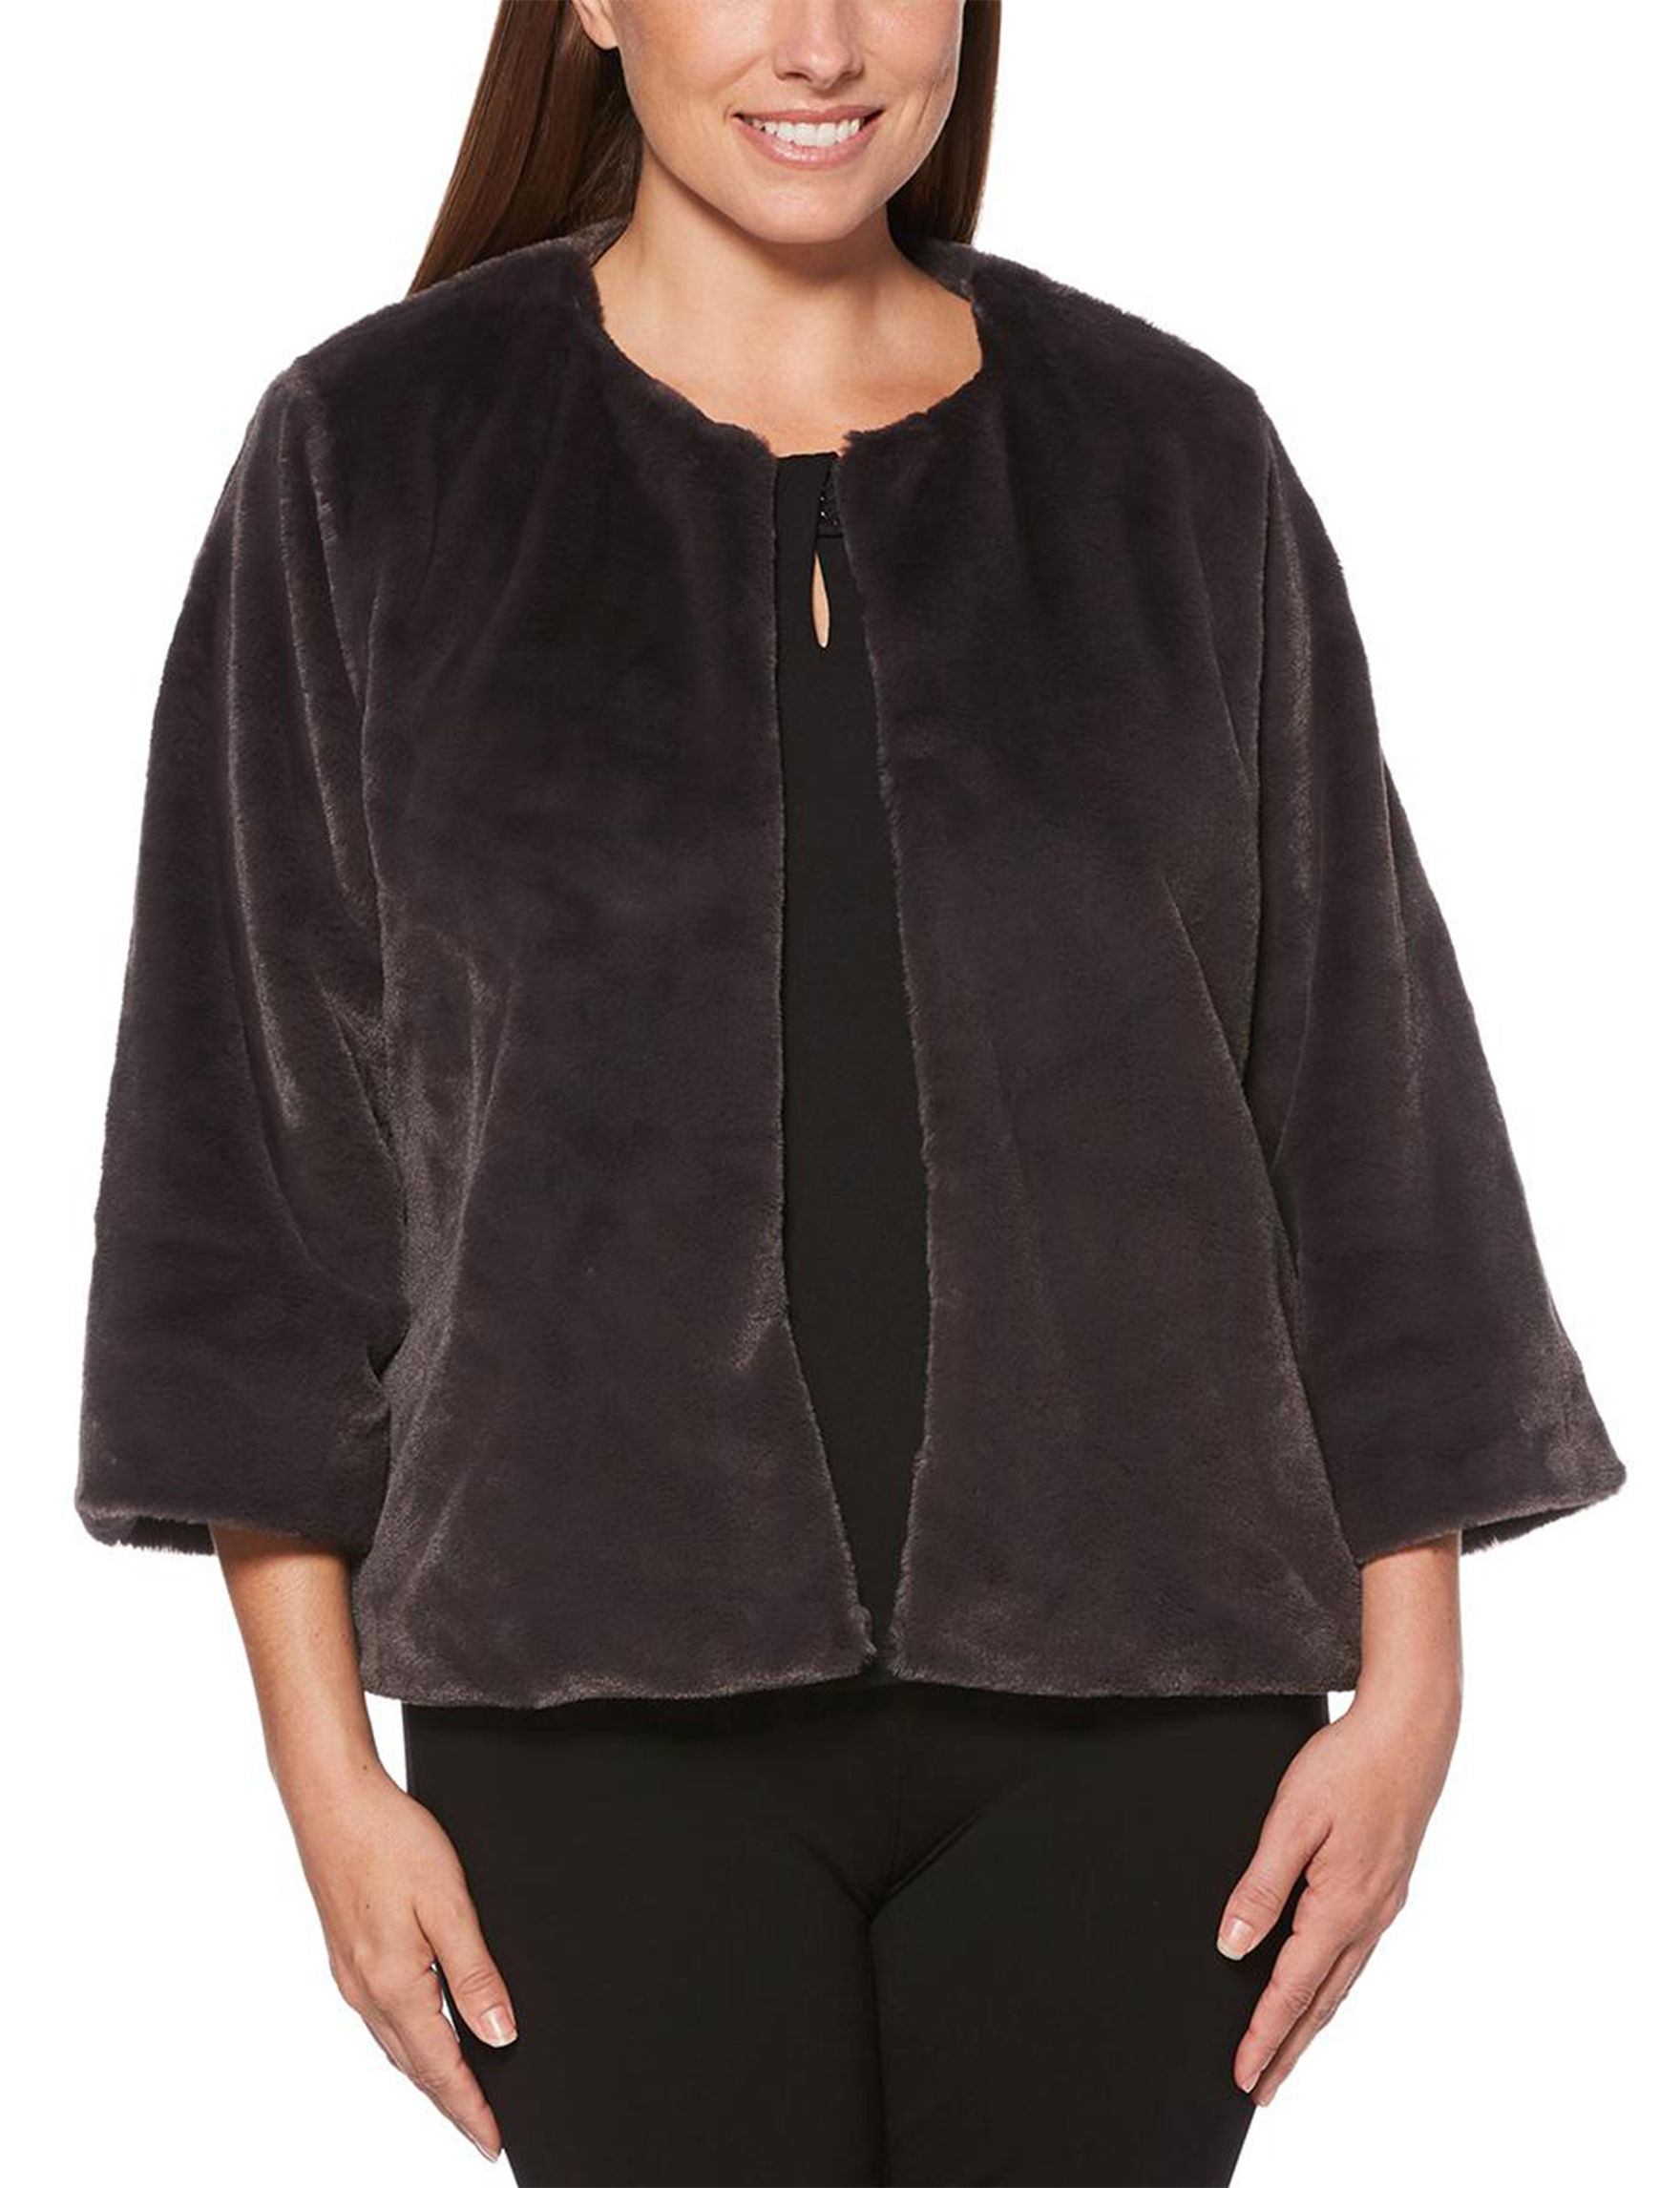 Rafaella Charcoal Lightweight Jackets & Blazers